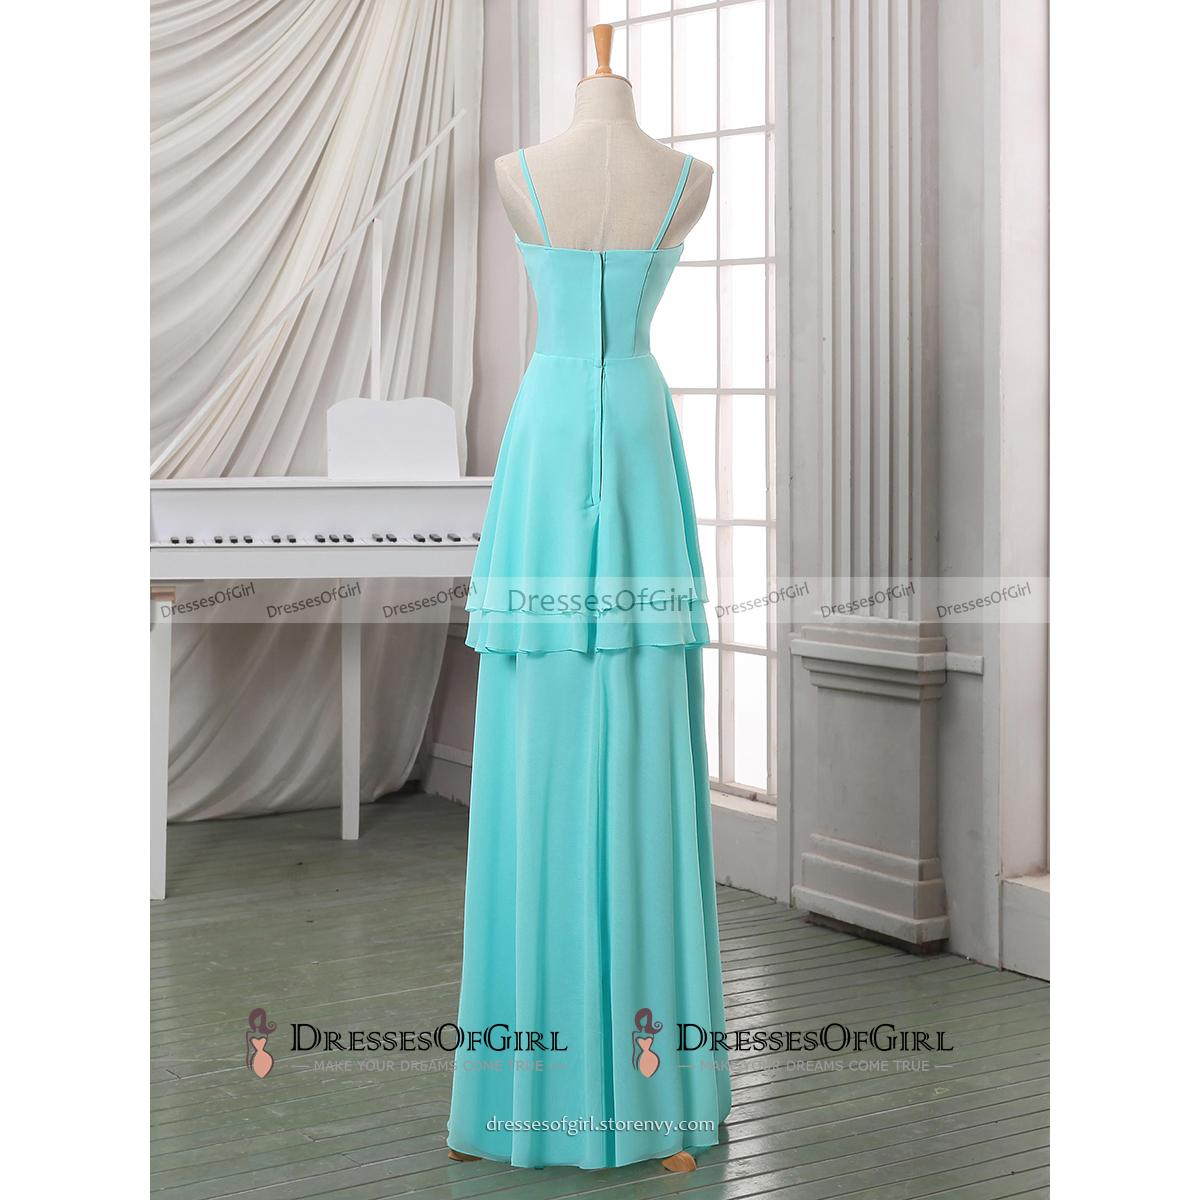 353ac1273387 Sequins Beaded V Neck Long Prom Dress